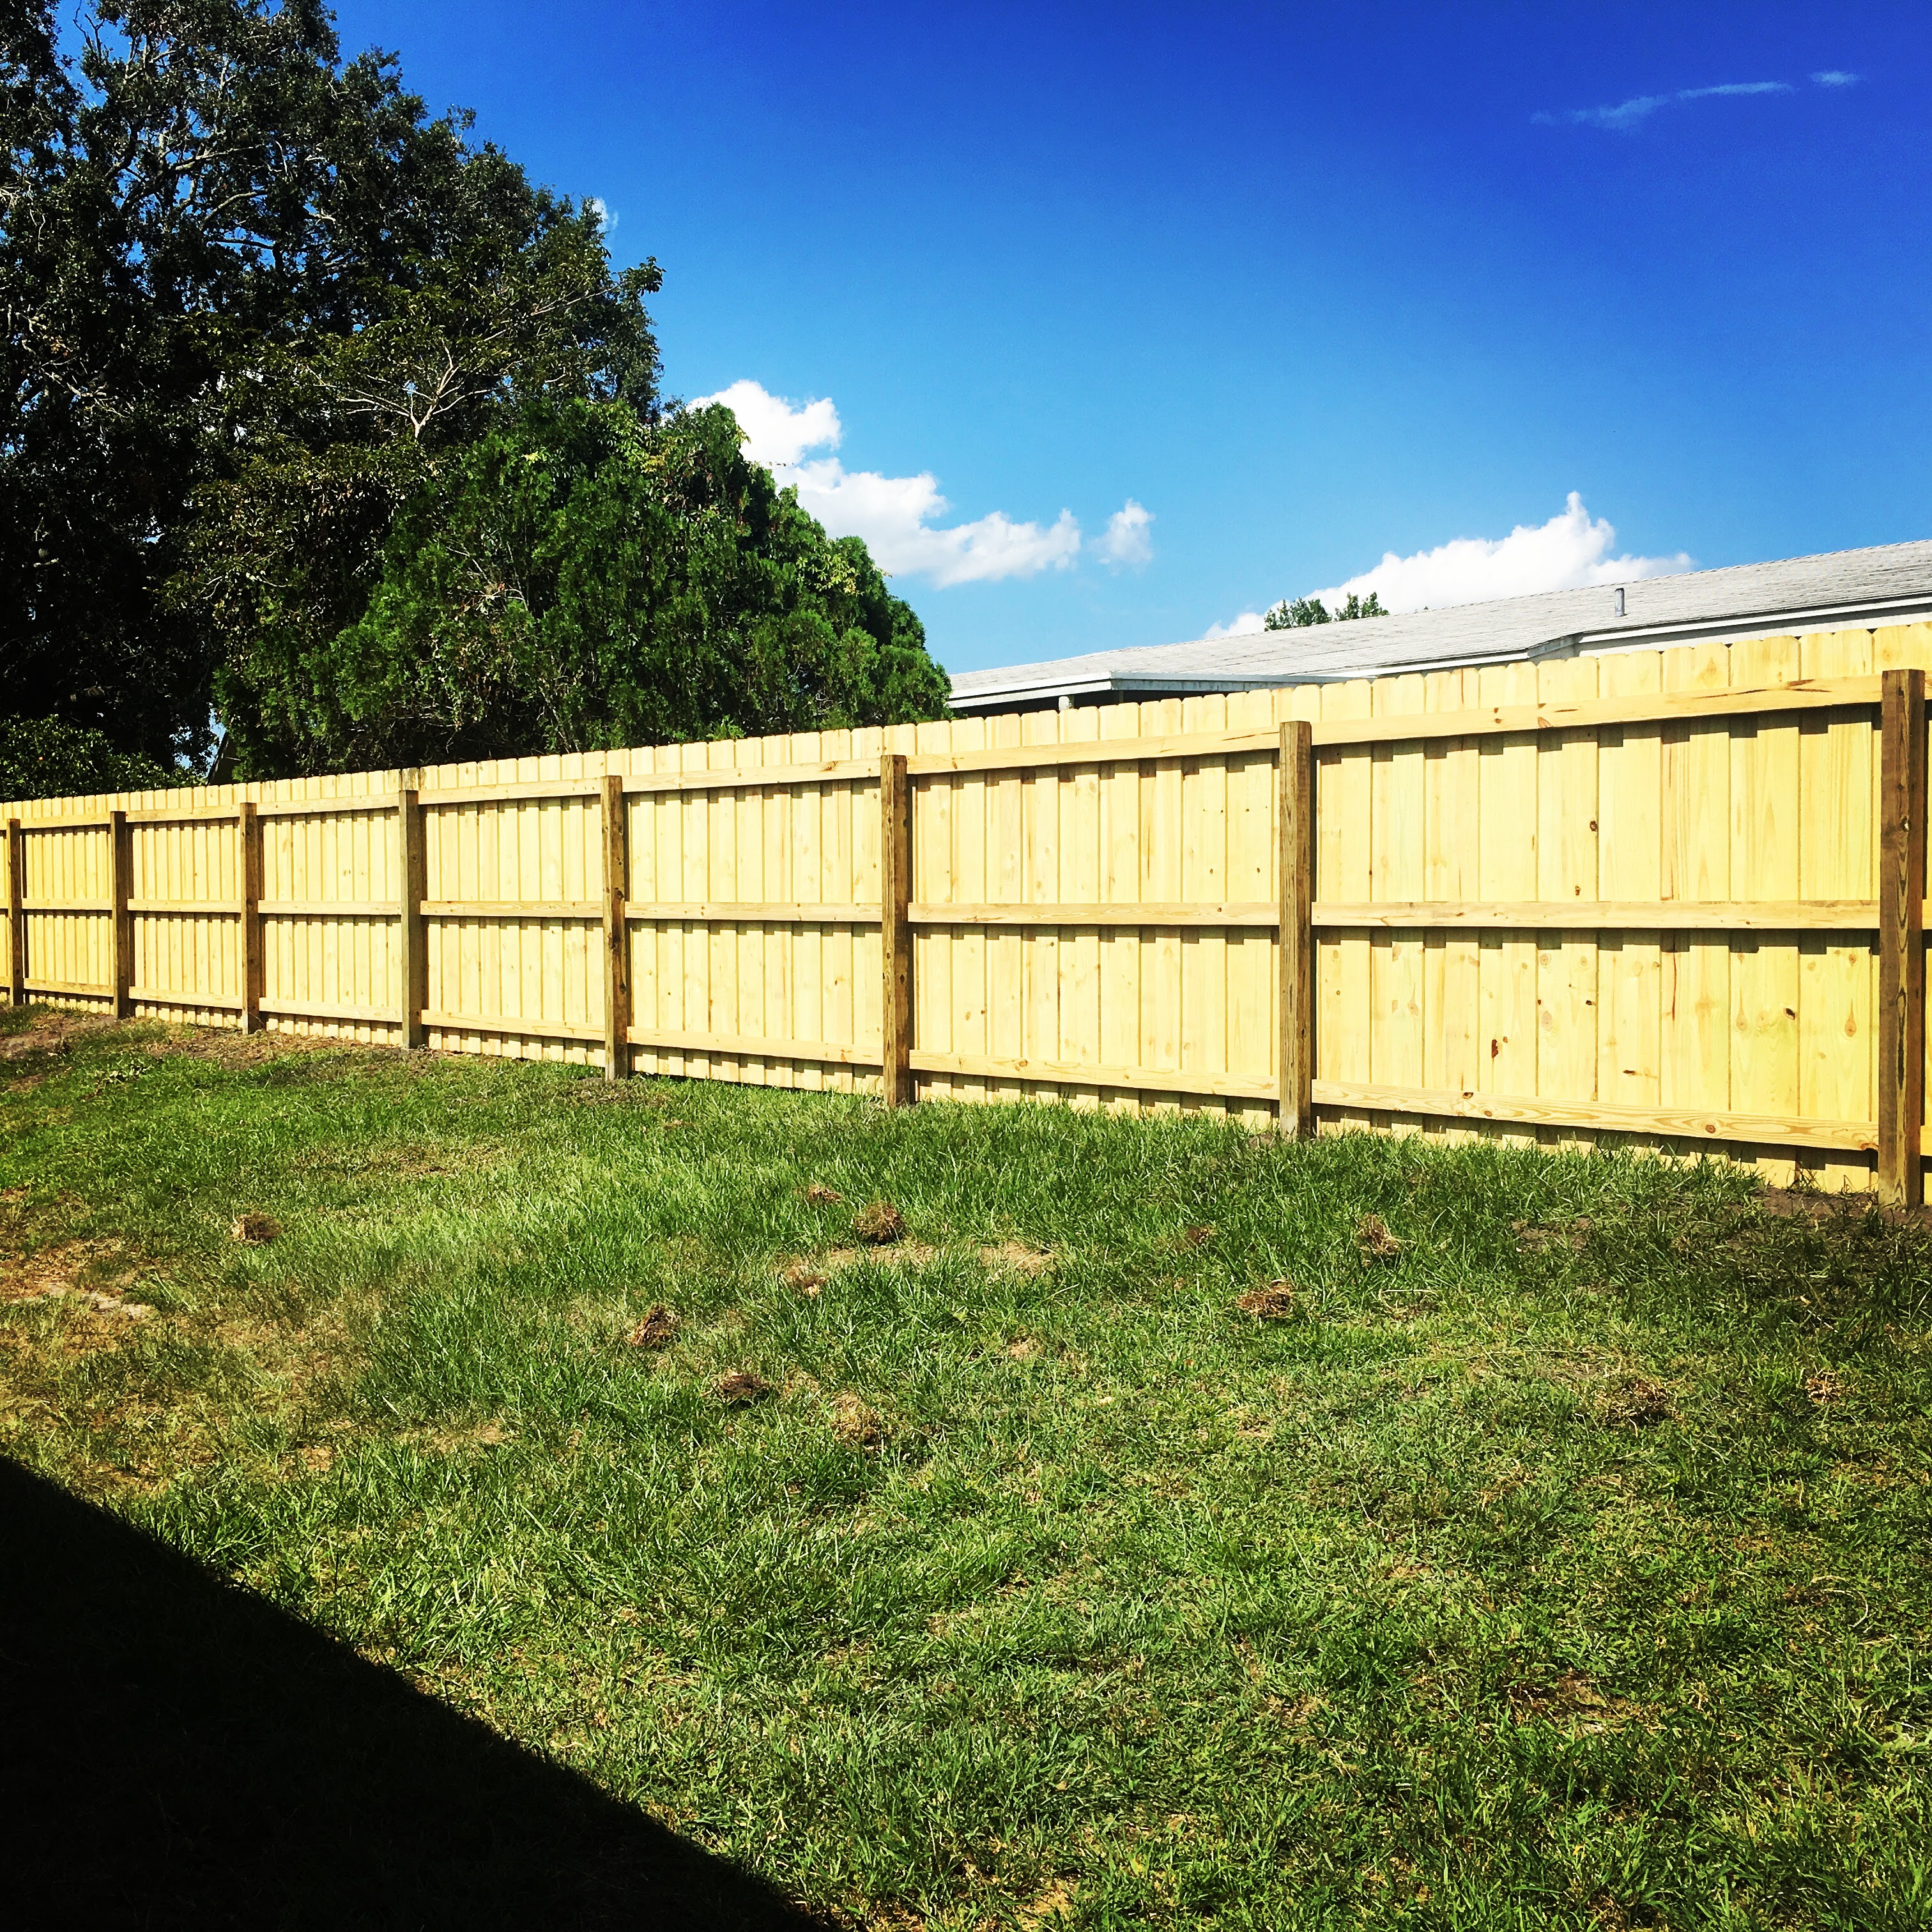 Fence panies Melbourne FL